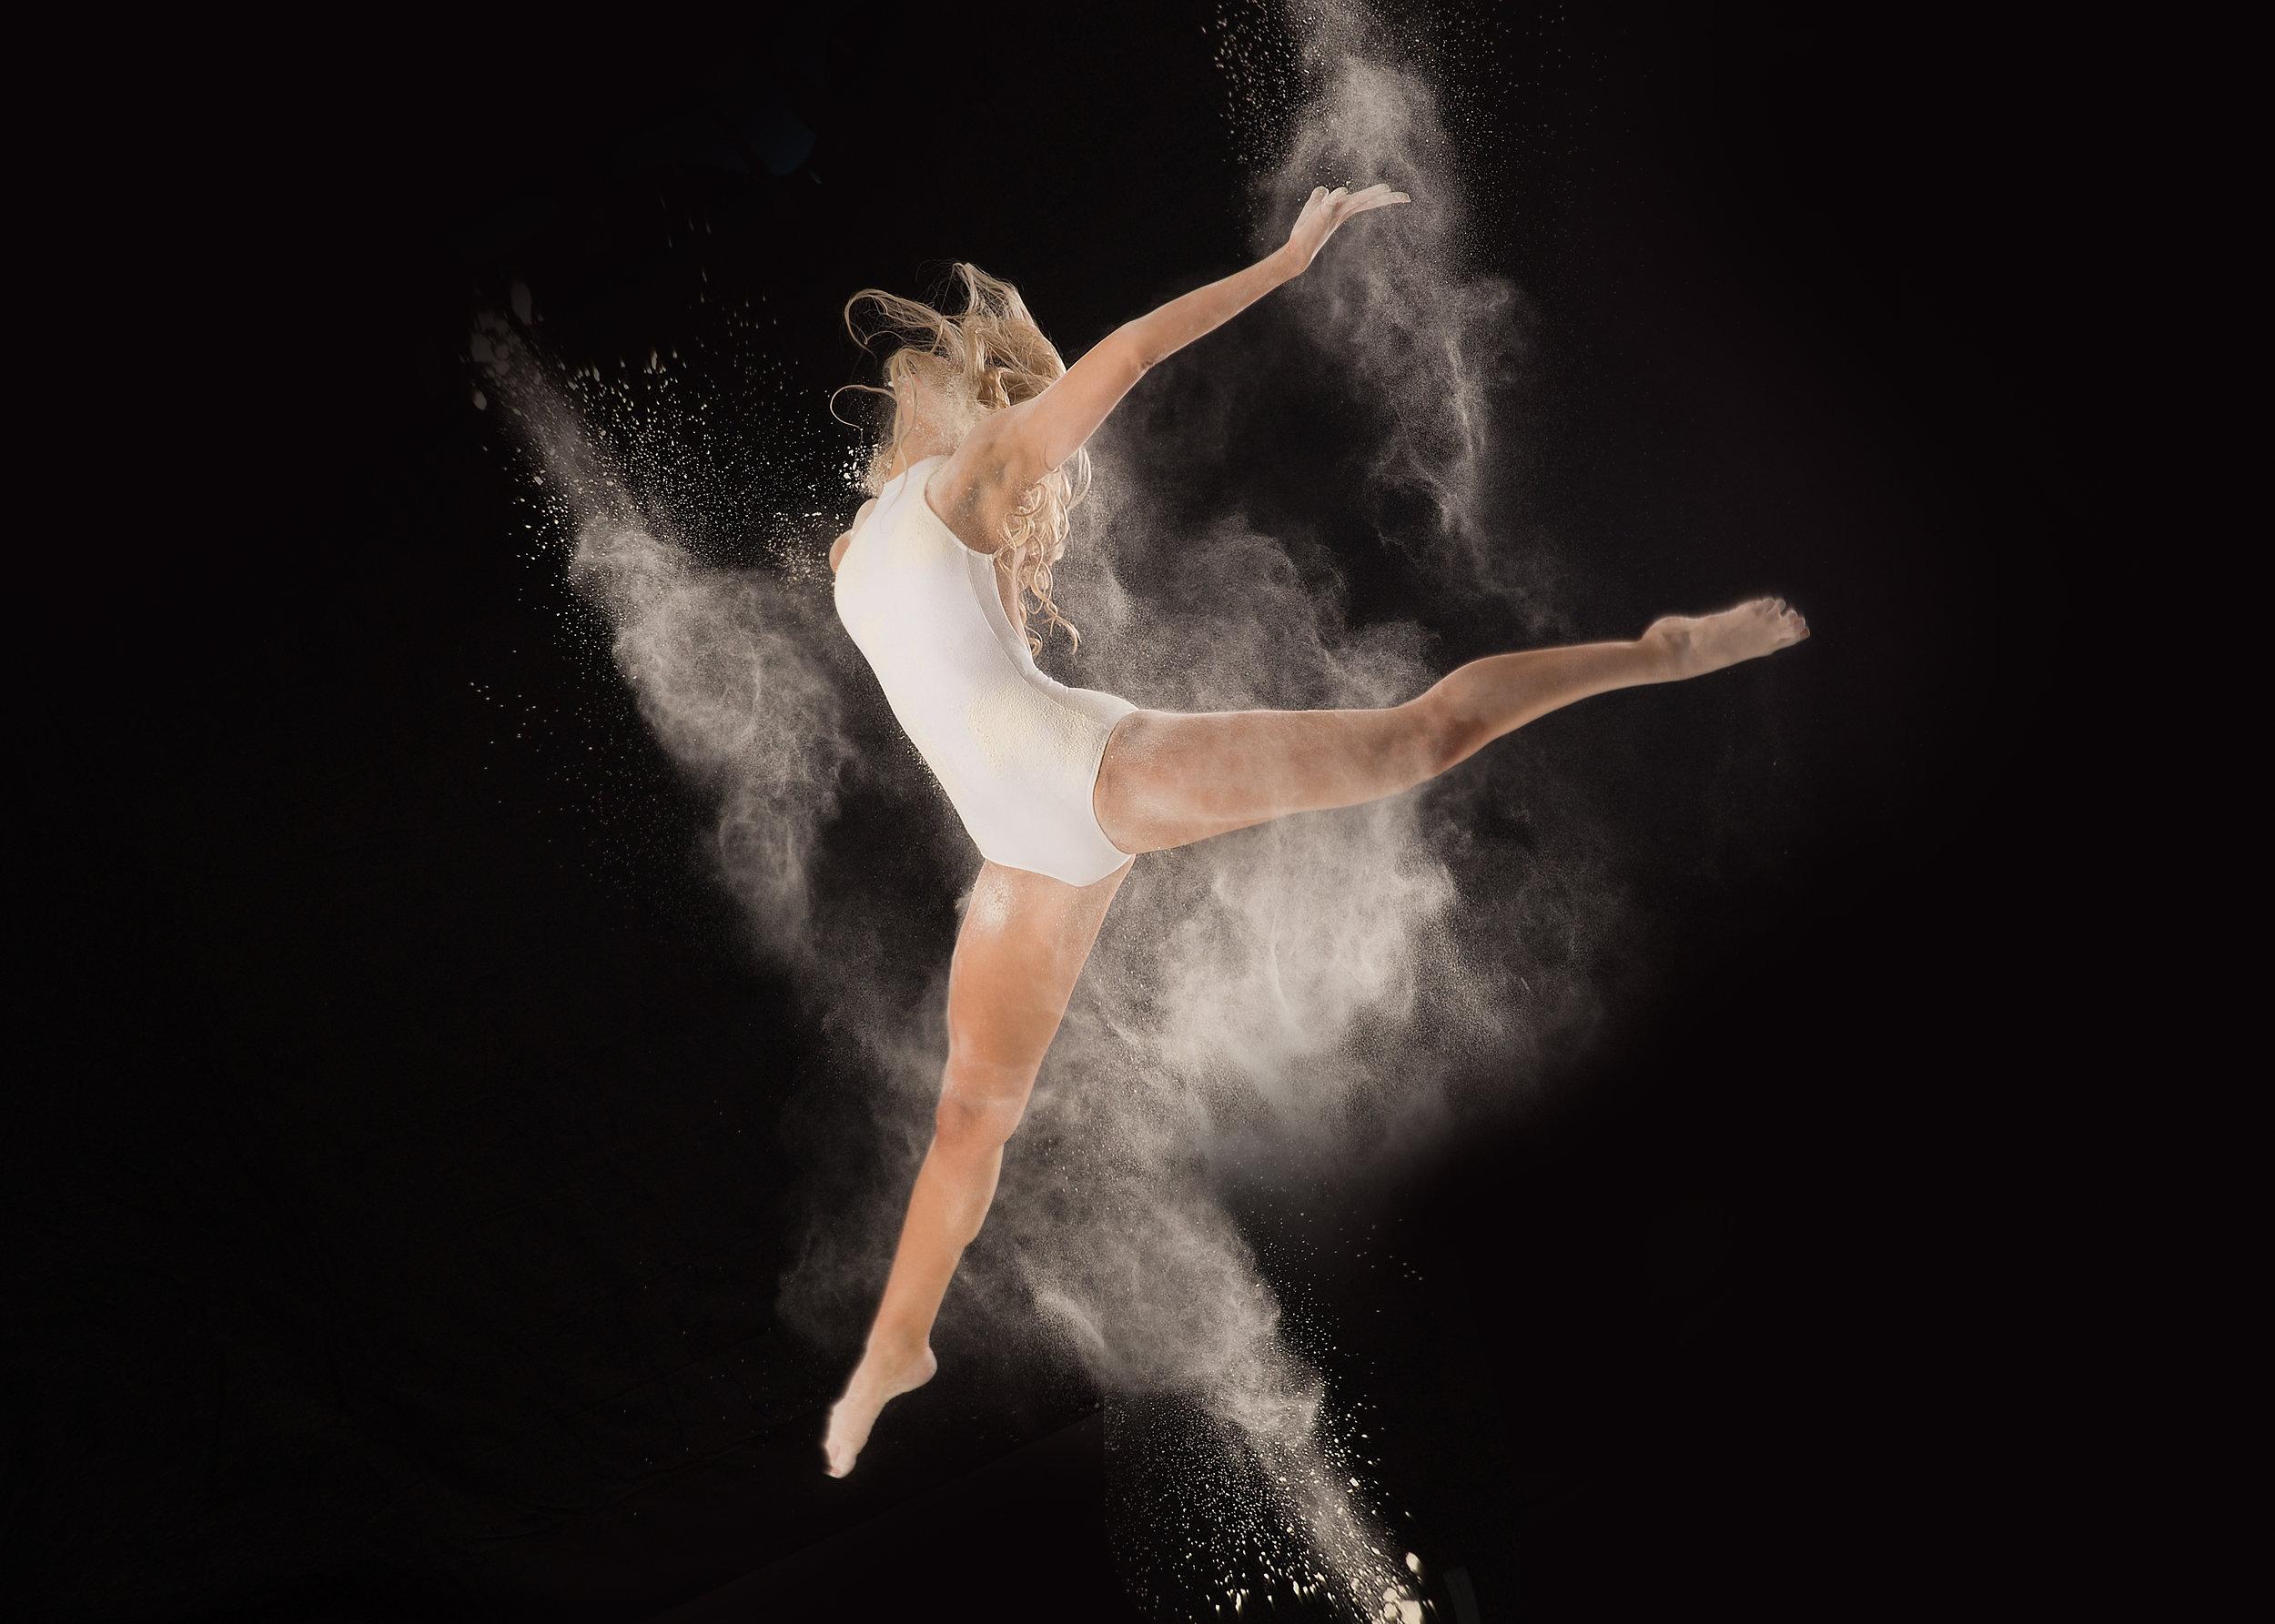 Houston Teen Photographer | Maribella Portraits, LLC | www.maribellaportraits.rocks